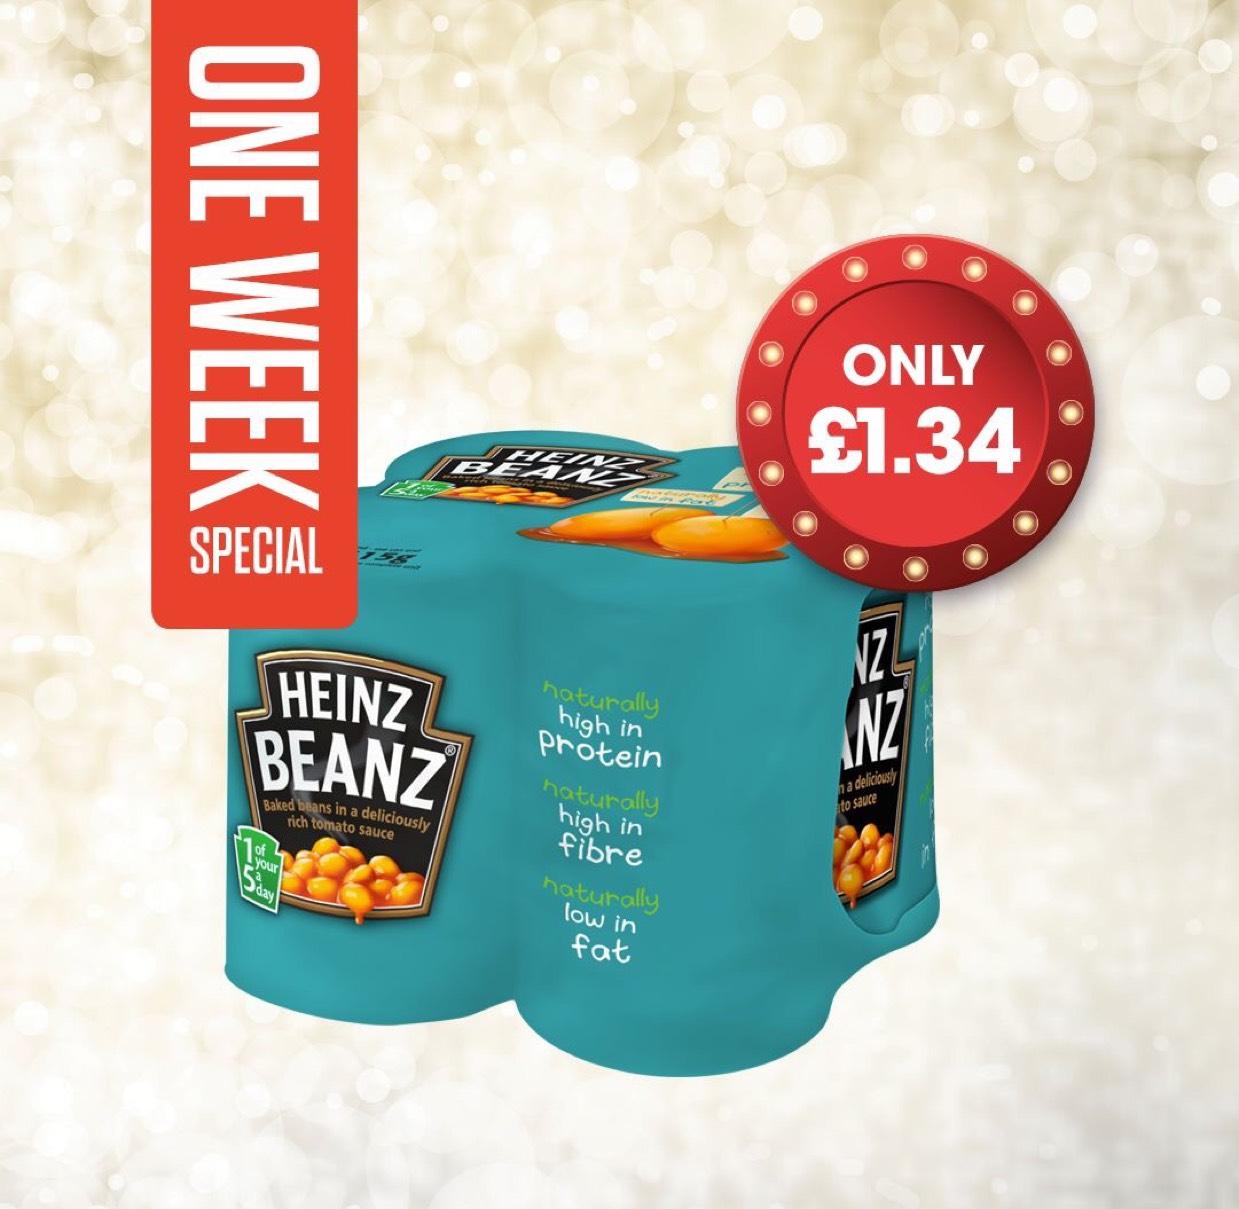 Heinz baked beanz 4 x 415g only £1.34 @ centra Northern Ireland